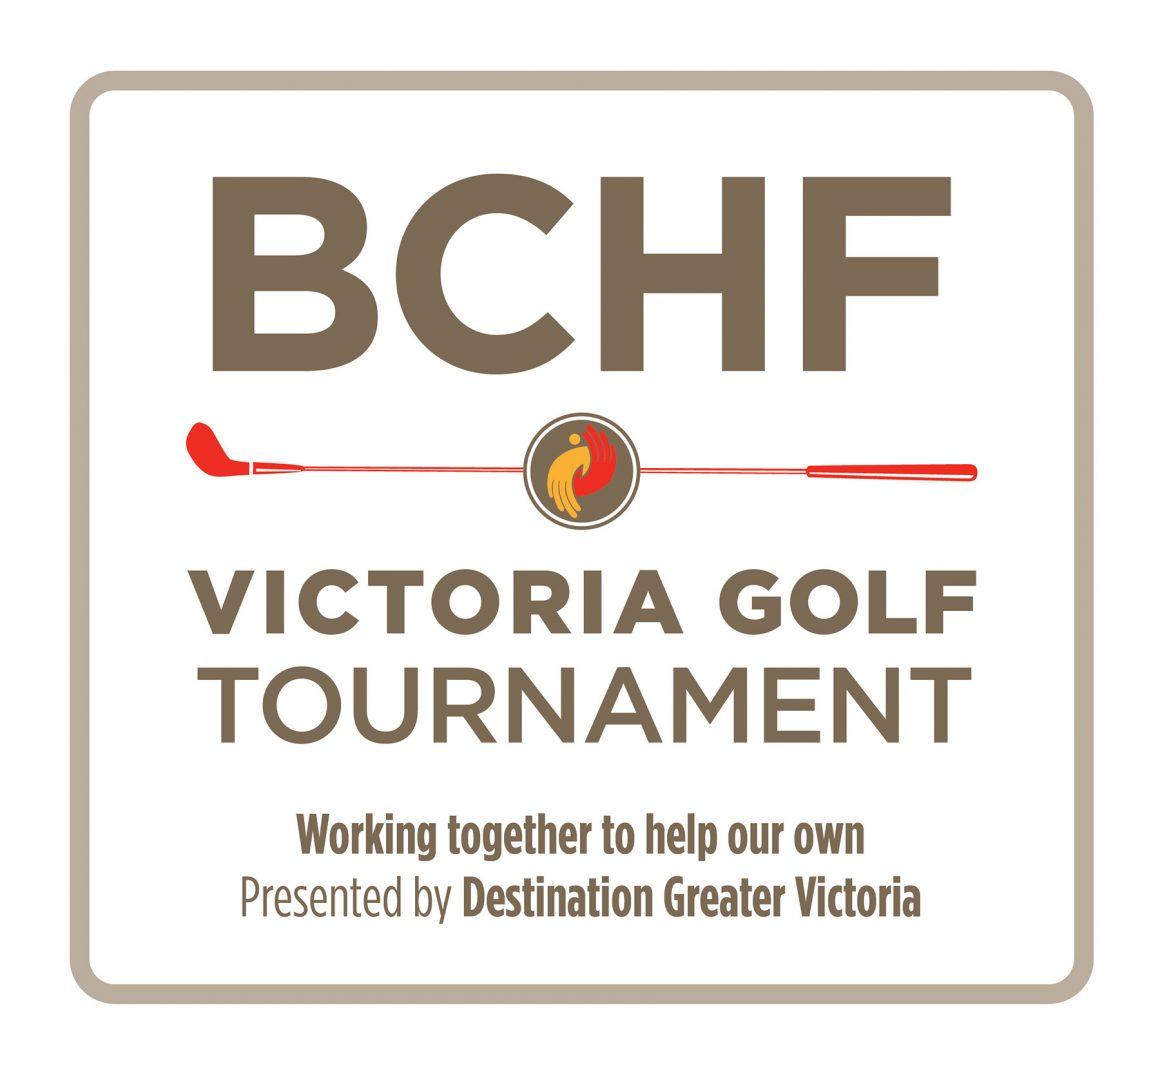 BCHF - Victoria Golf Tournament 2019 - BC Hospitality Foundation